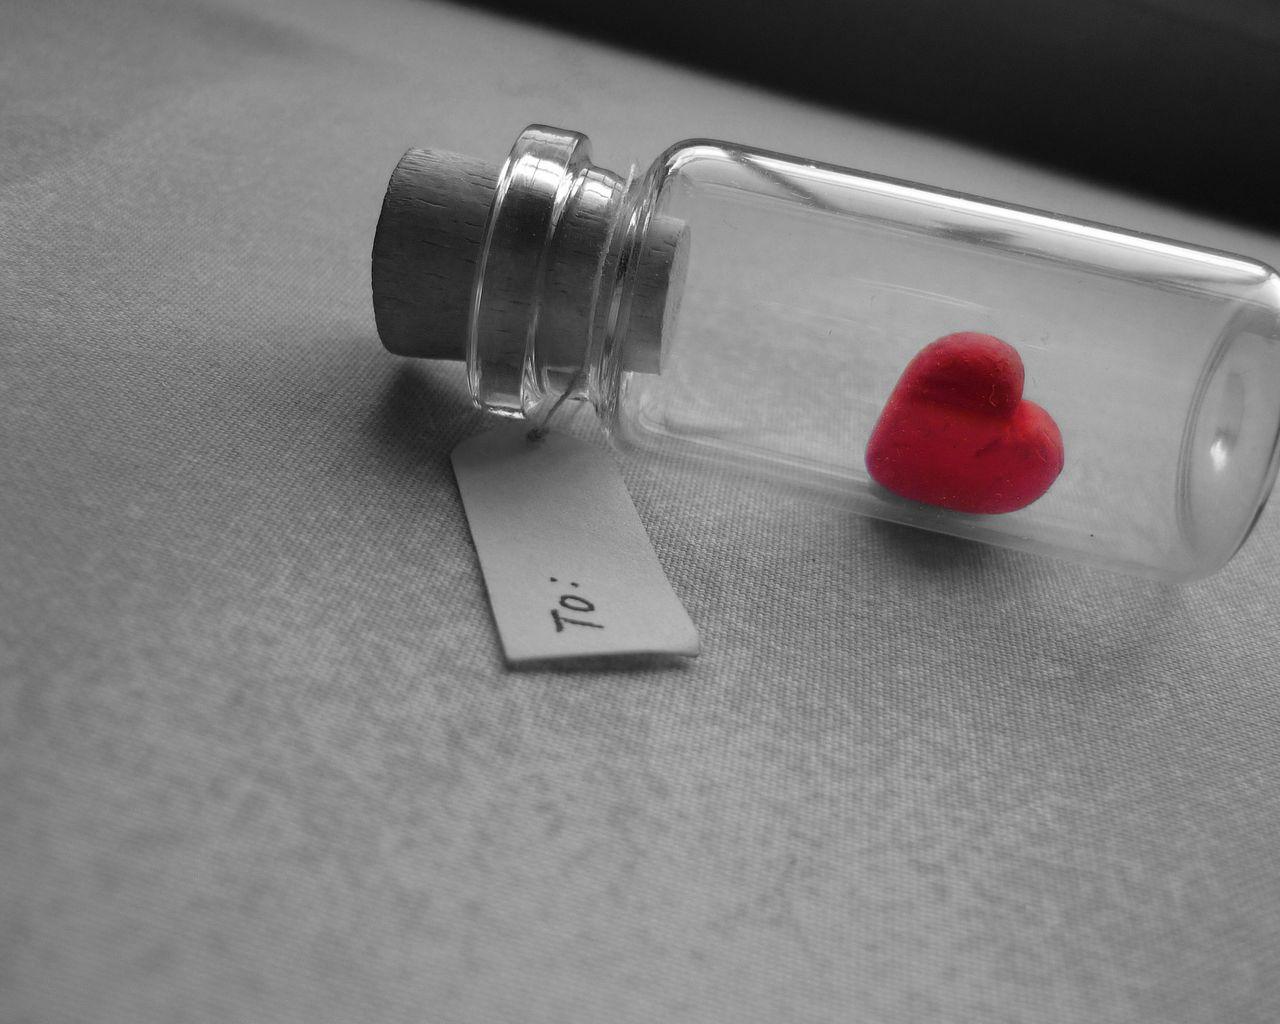 1280x1024 Wallpaper love, heart, bank, tag, glass, silver